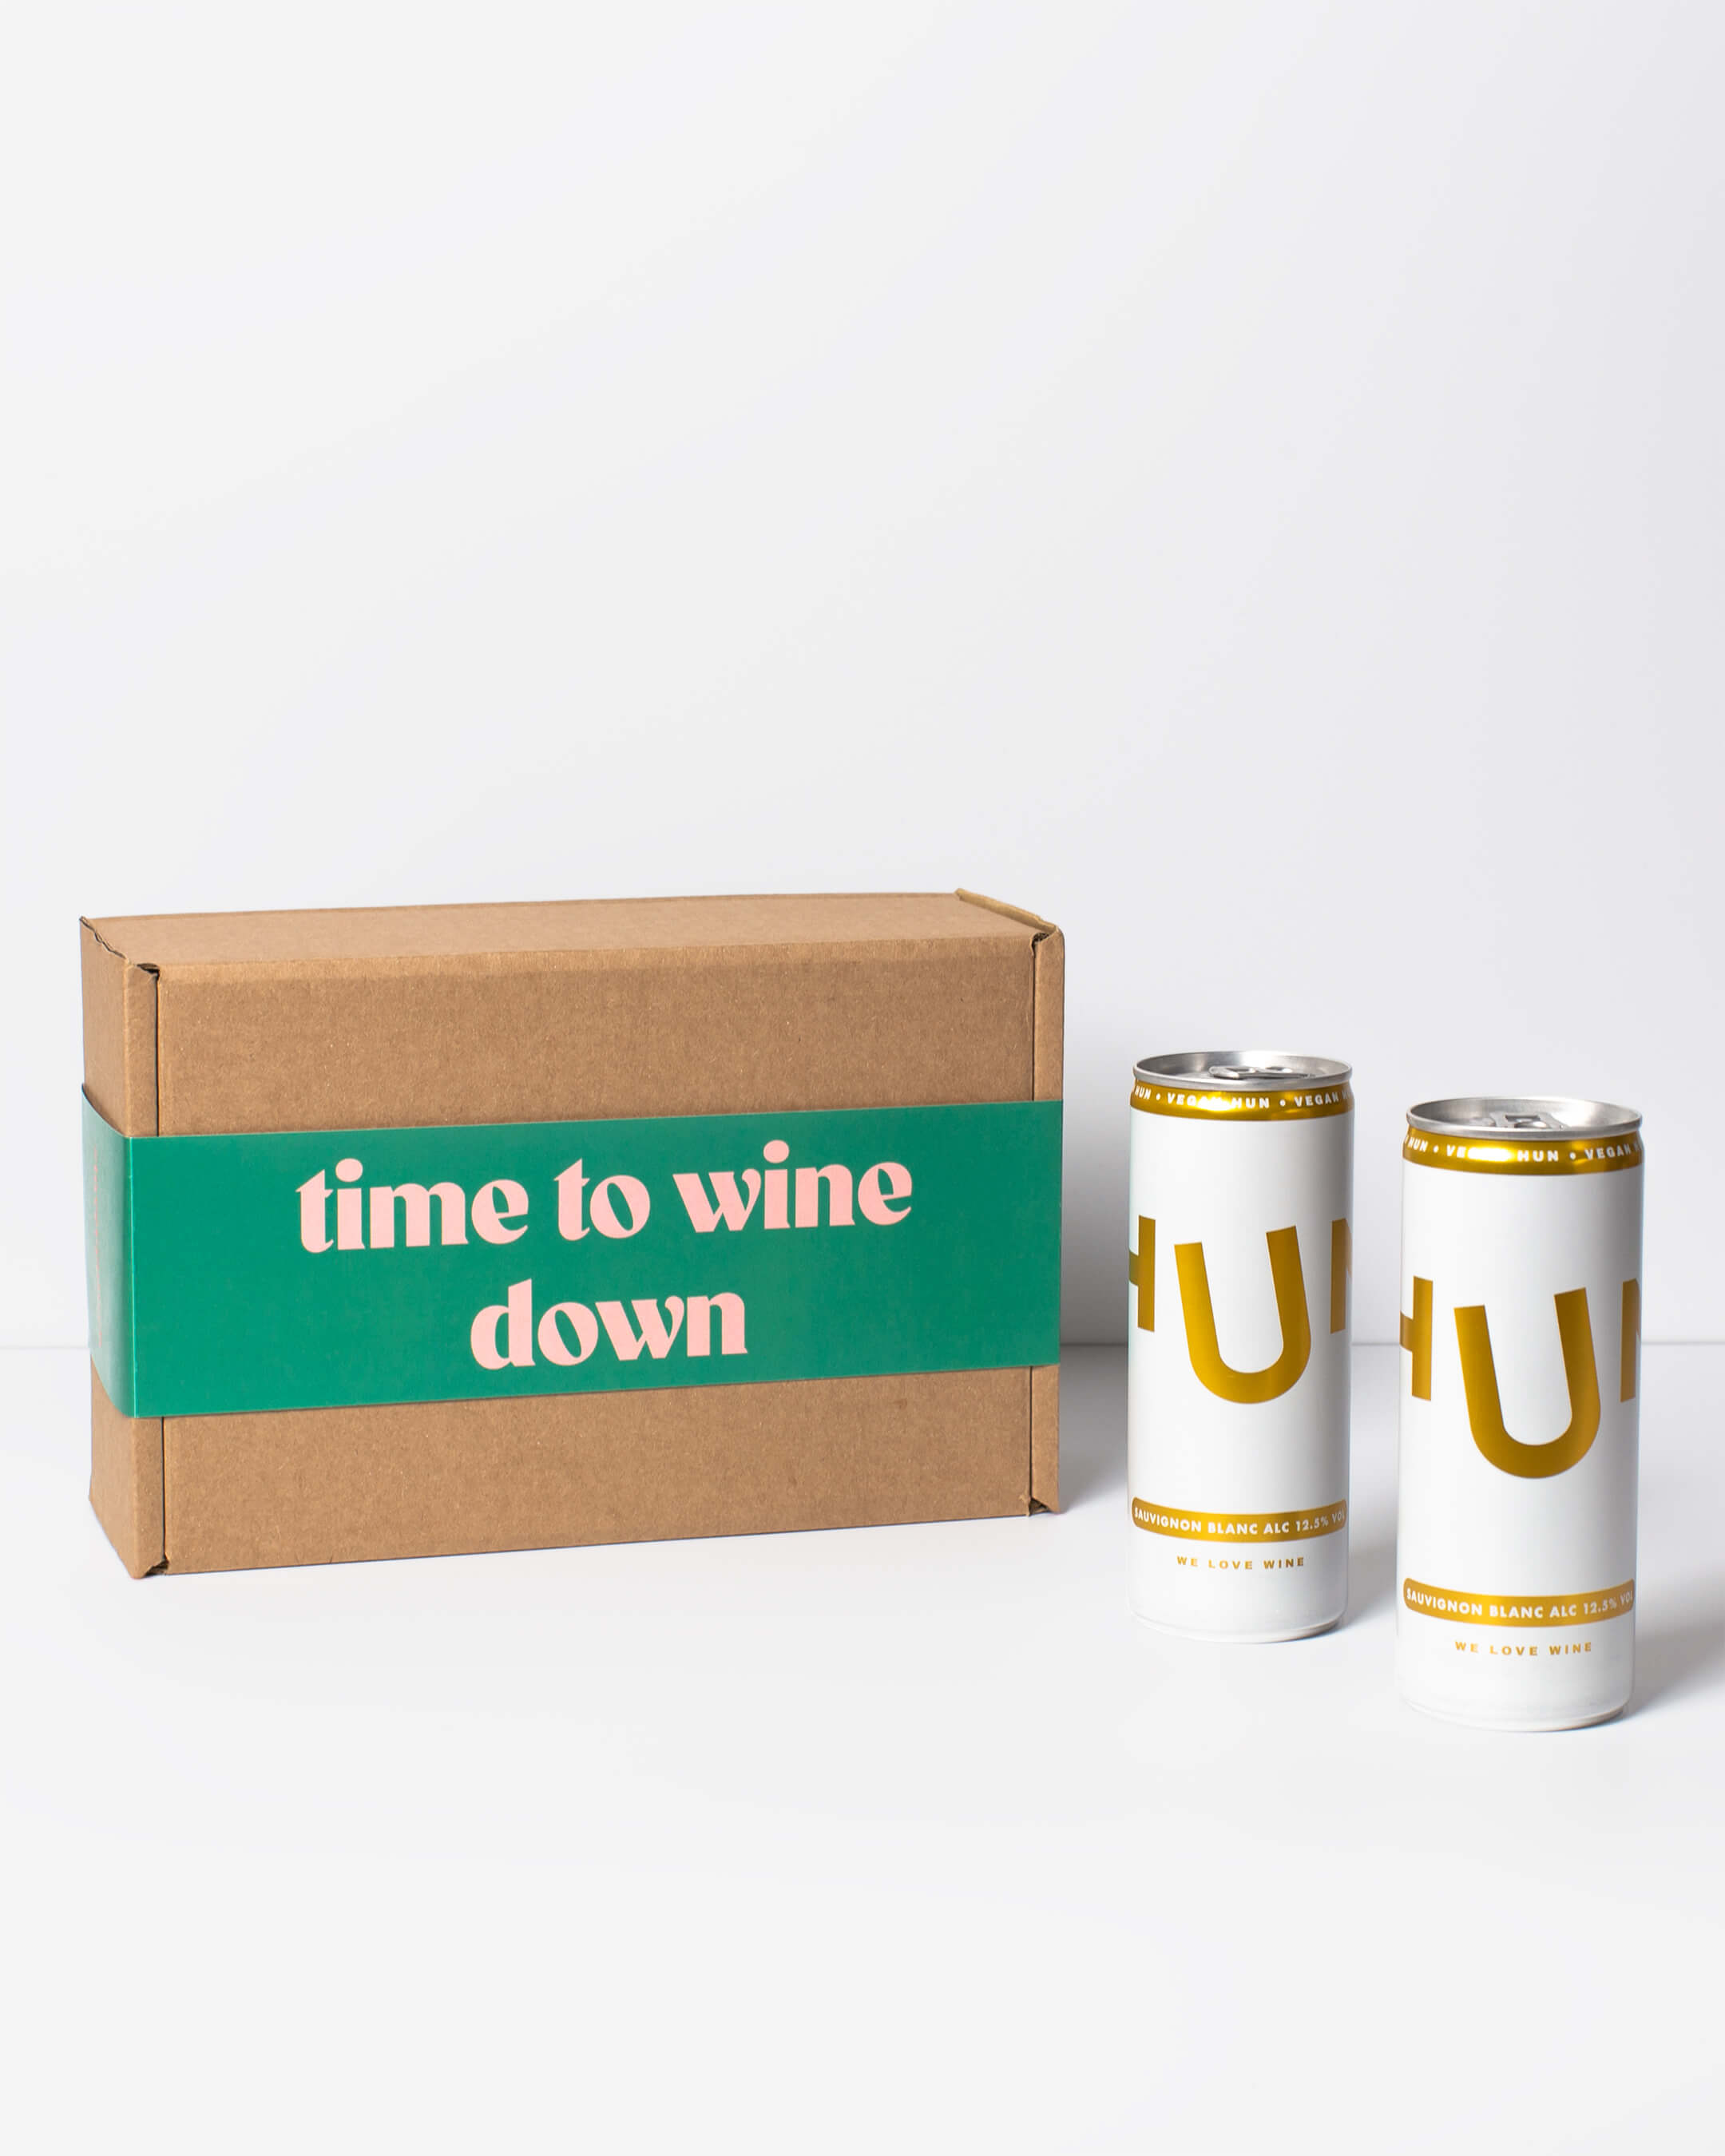 Hun white wine cans & ta. box